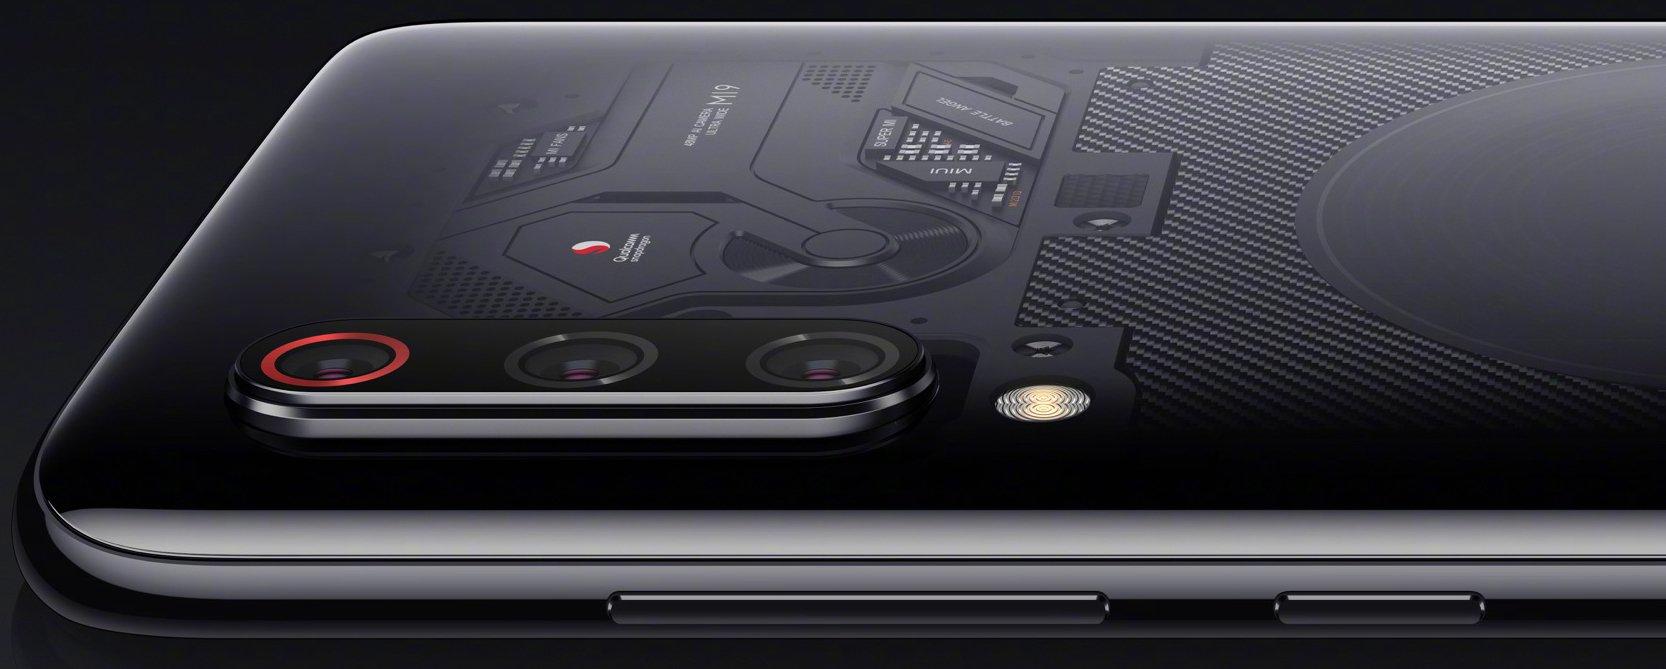 Xiaomi Mi 9 Explore Özellikleri